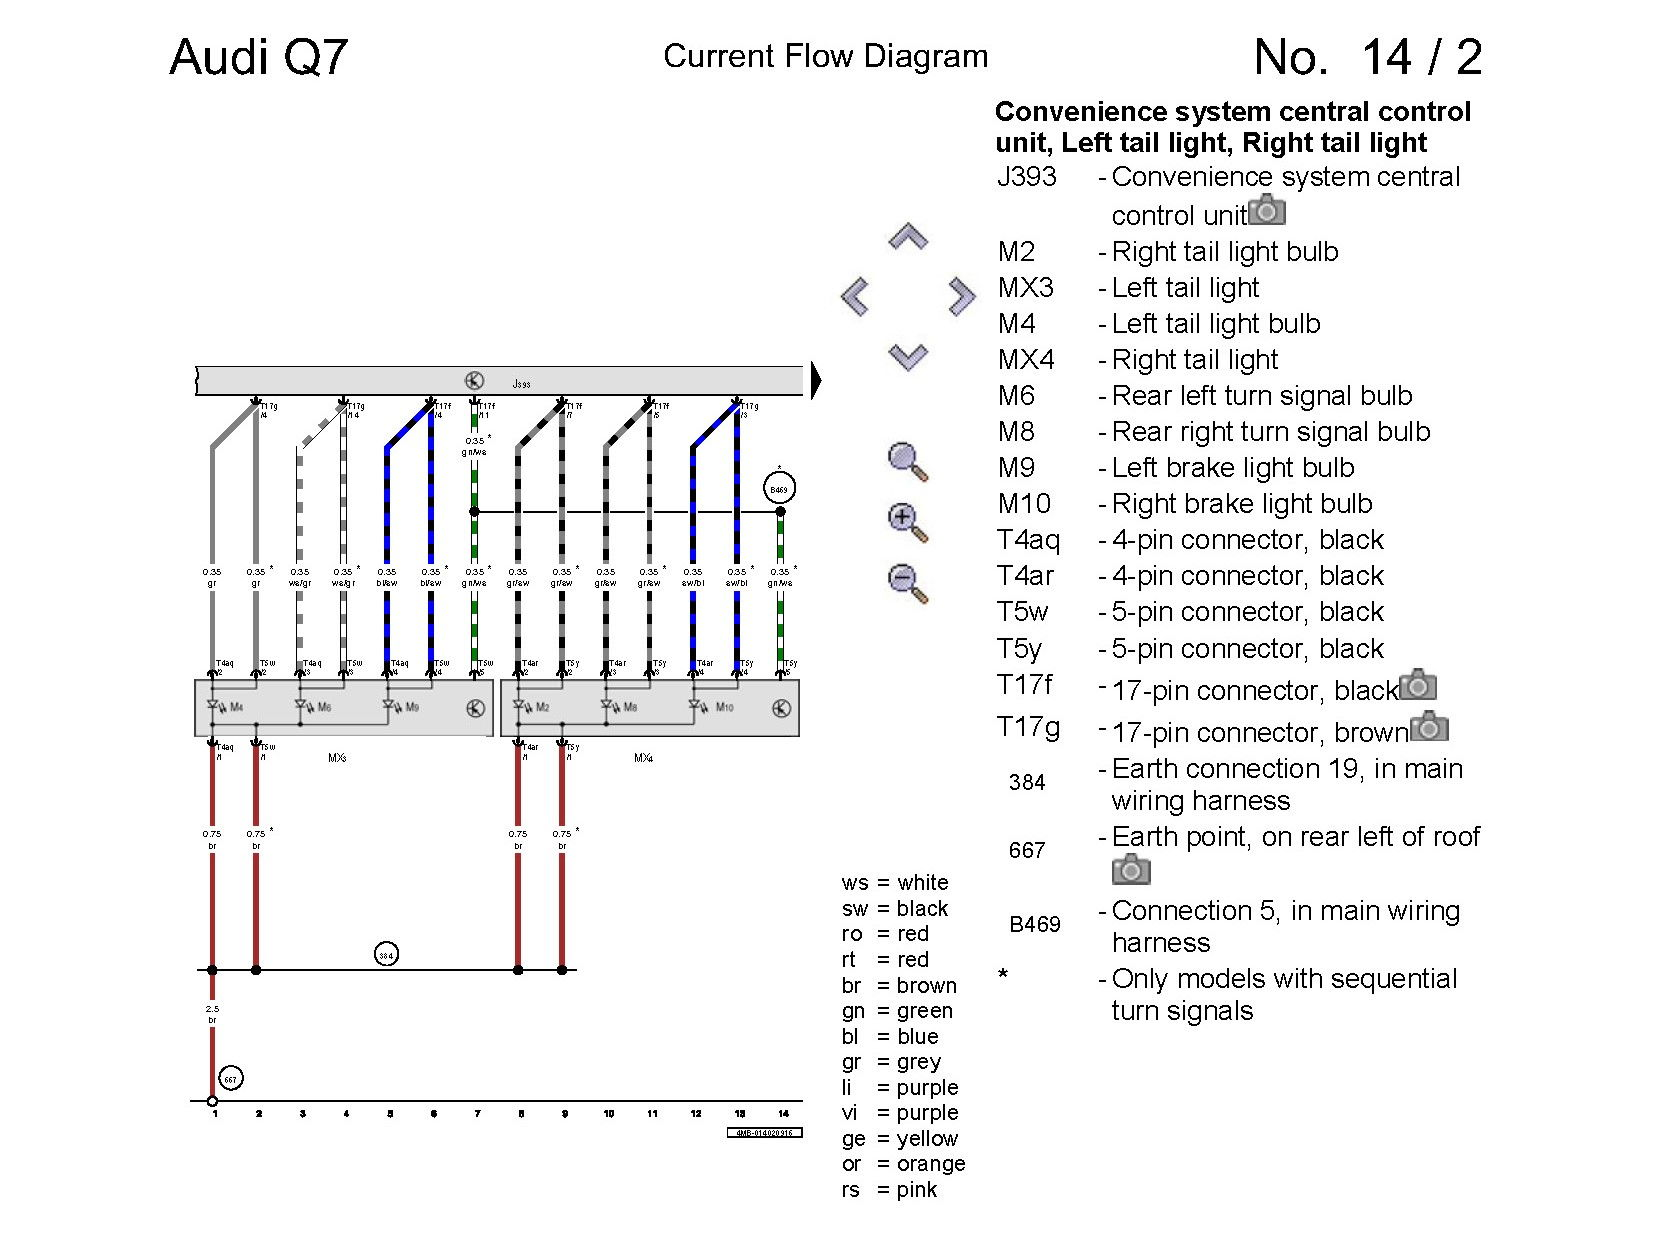 DIAGRAM] Volvo B7r Wiring Diagram FULL Version HD Quality Wiring Diagram -  DIAGRAMTHIS.SPANOBAR.IT | Volvo B7r Wiring Diagram |  | Diagram Database